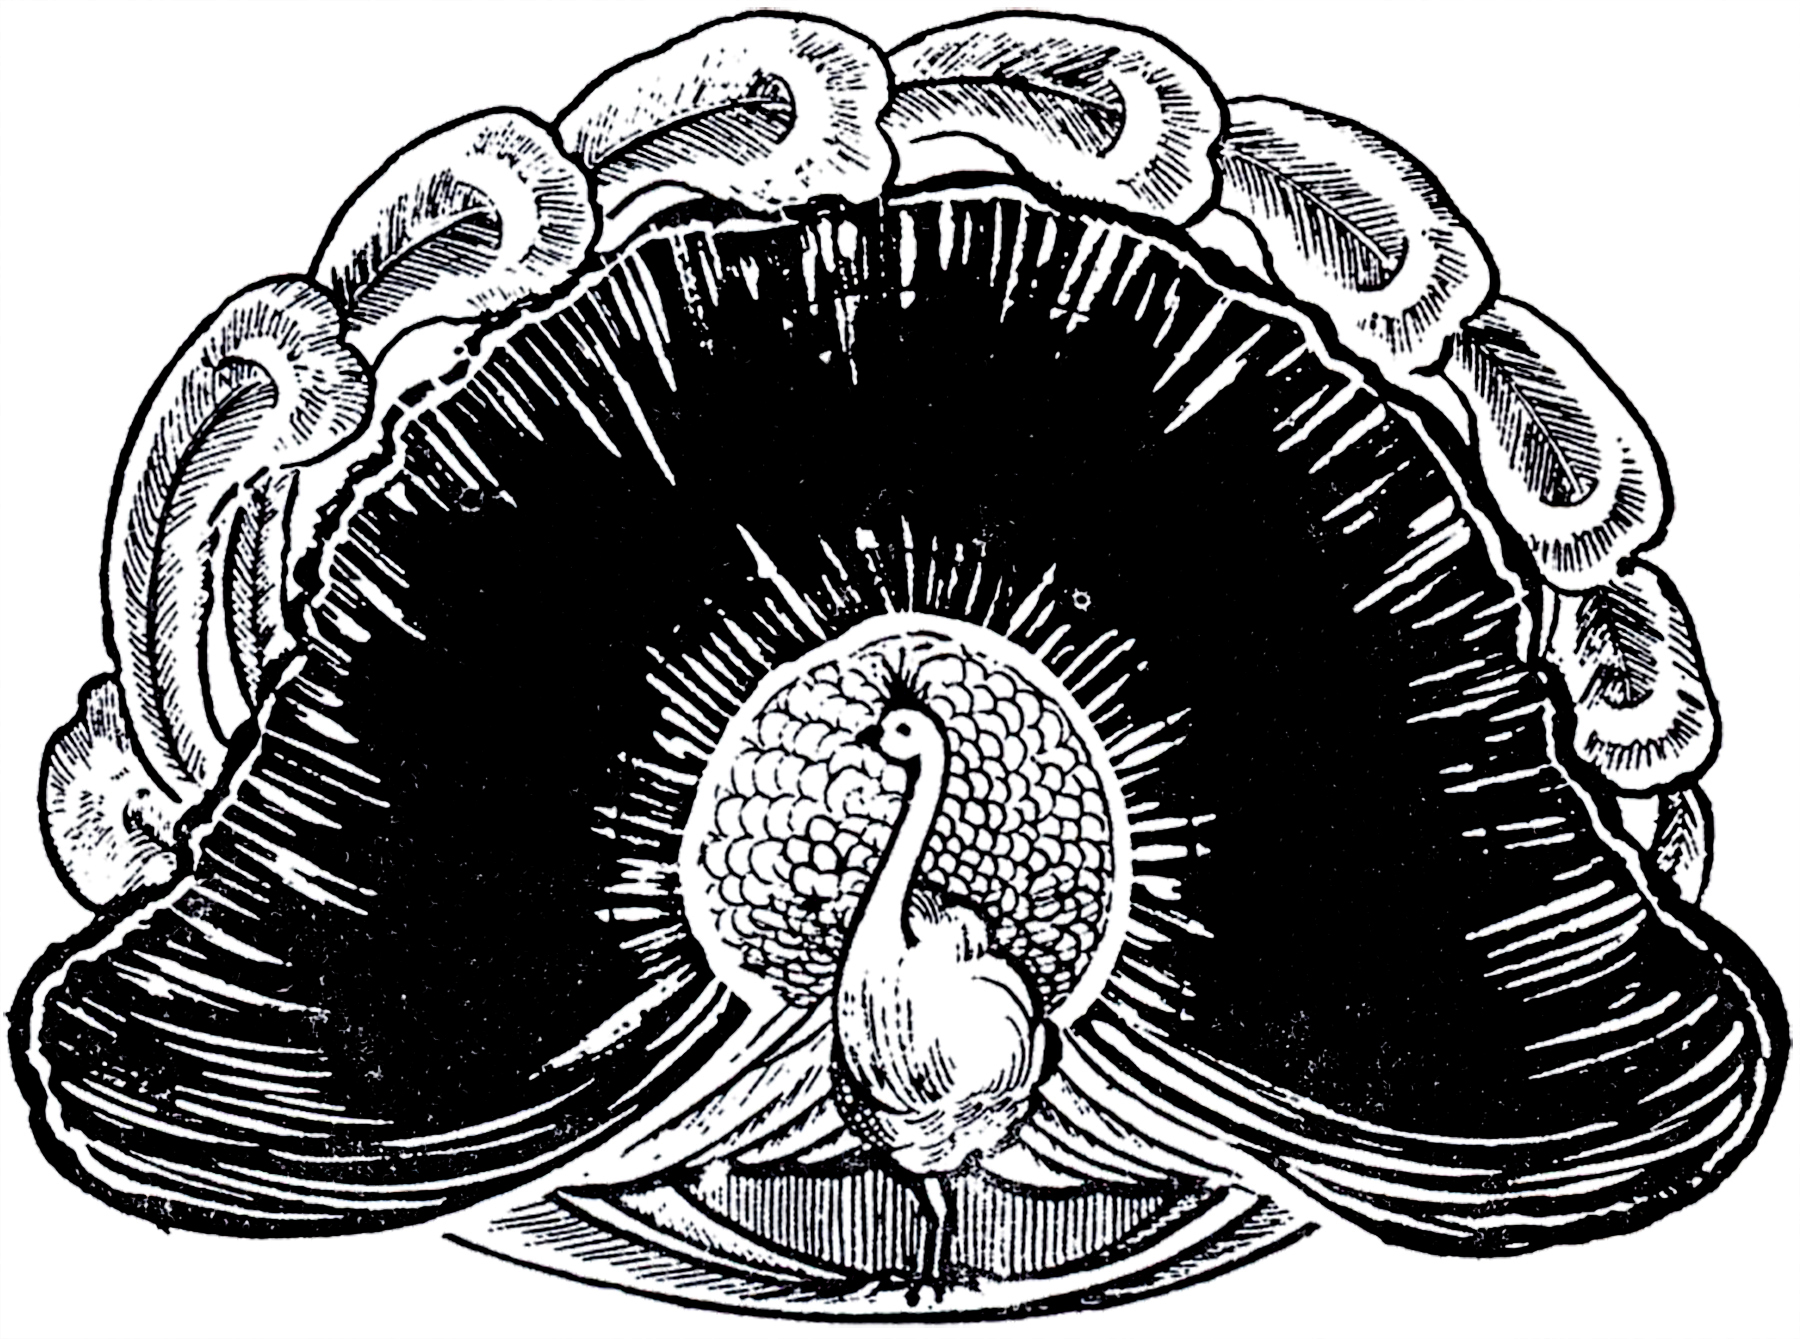 1800x1339 Wonderful Peacock Image